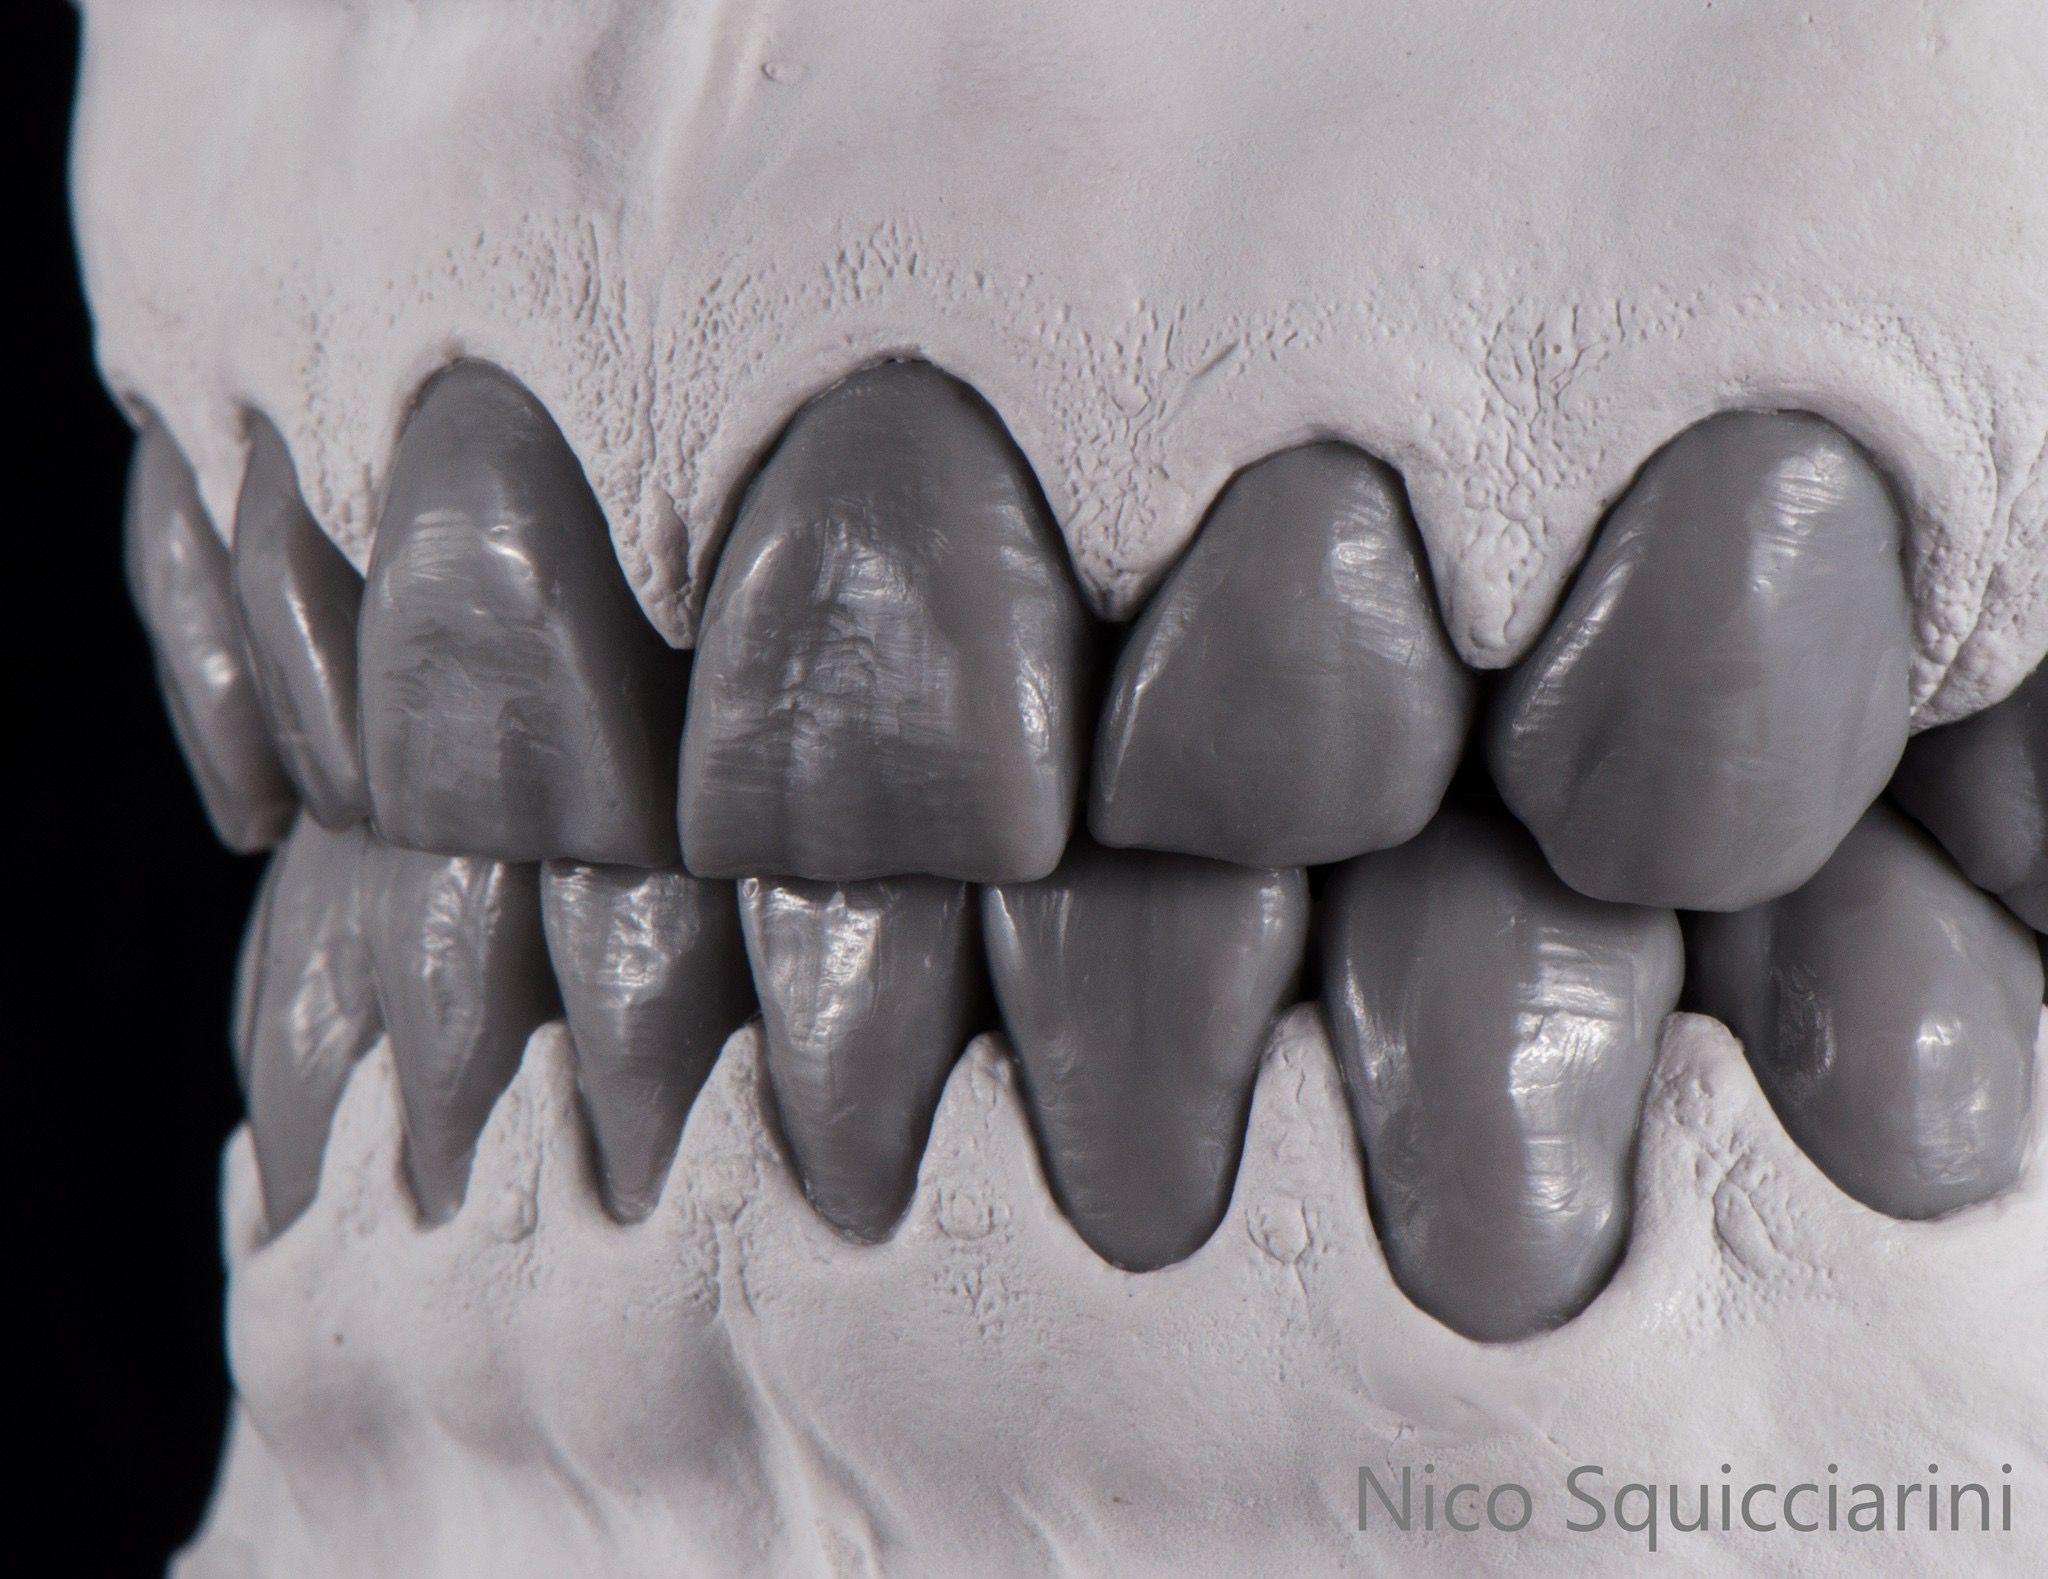 Pin by Anton Popov on zahn | Pinterest | Dental and Dental anatomy